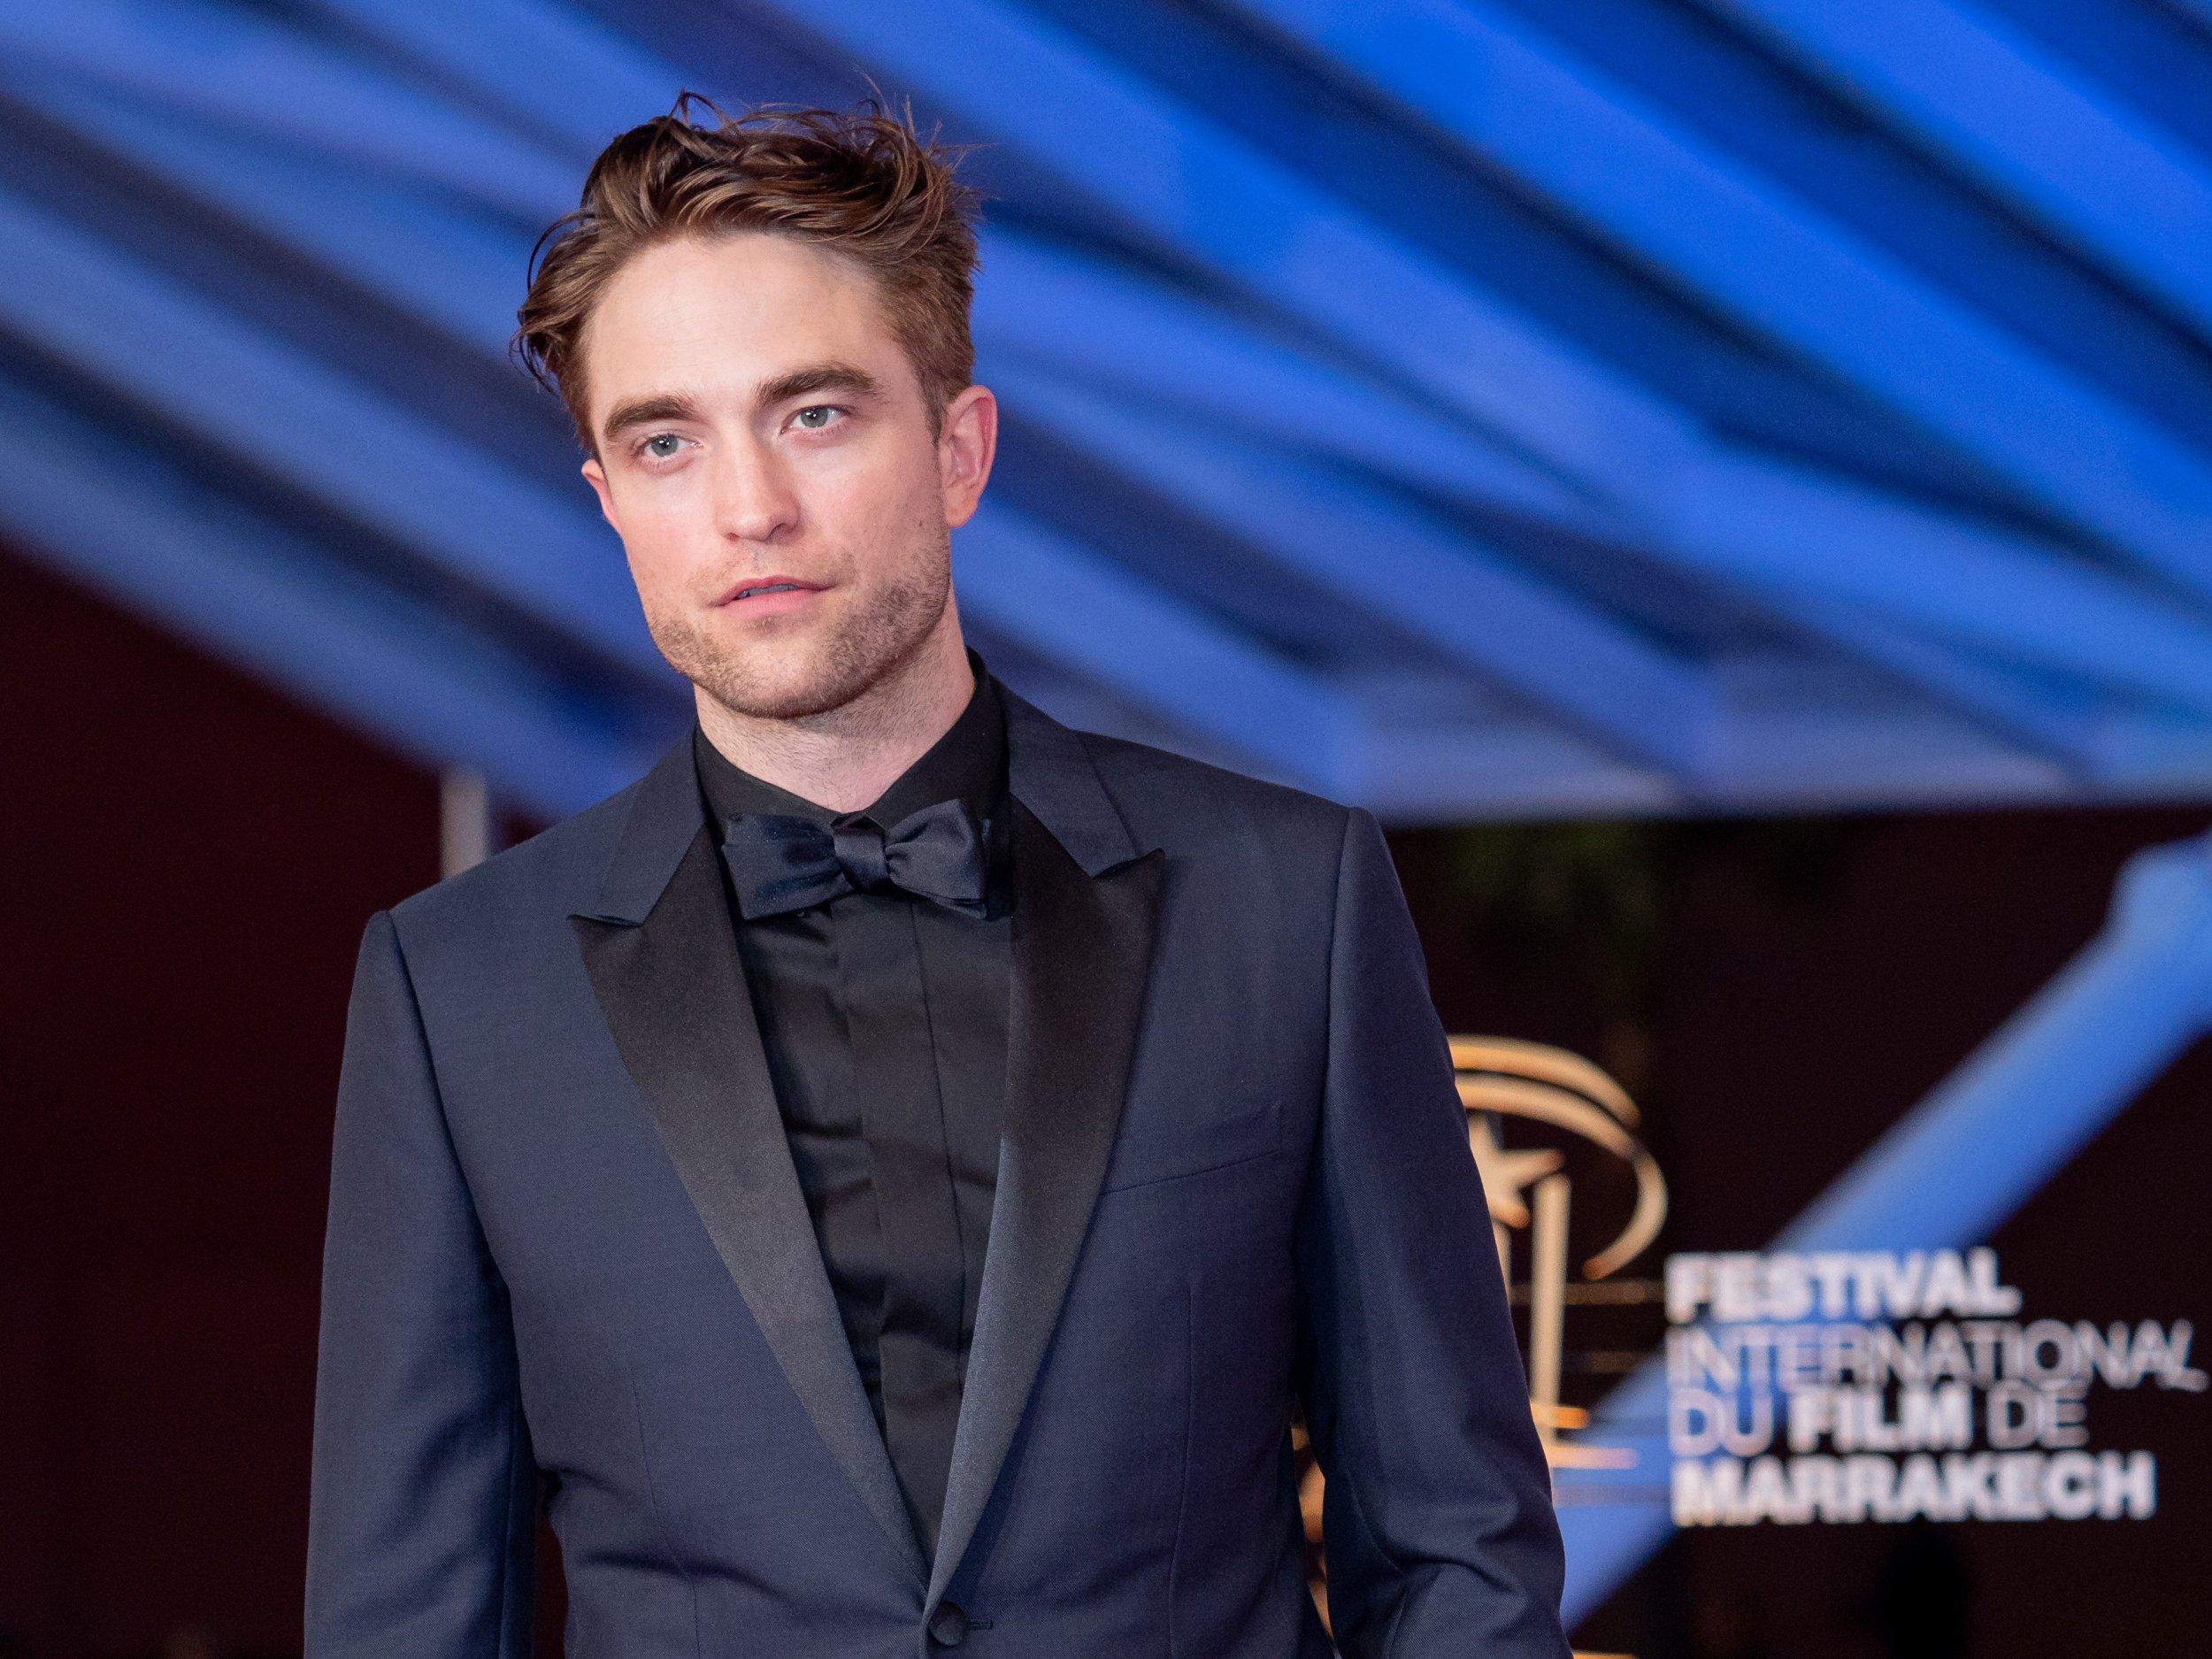 Mandatory Credit: Photo by Laurent VU/SIPA/REX/Shutterstock (10010782m) Robert Pattinson attends the Opening Ceremony Marrakech Film Festival, Morocco - 30 Nov 2018